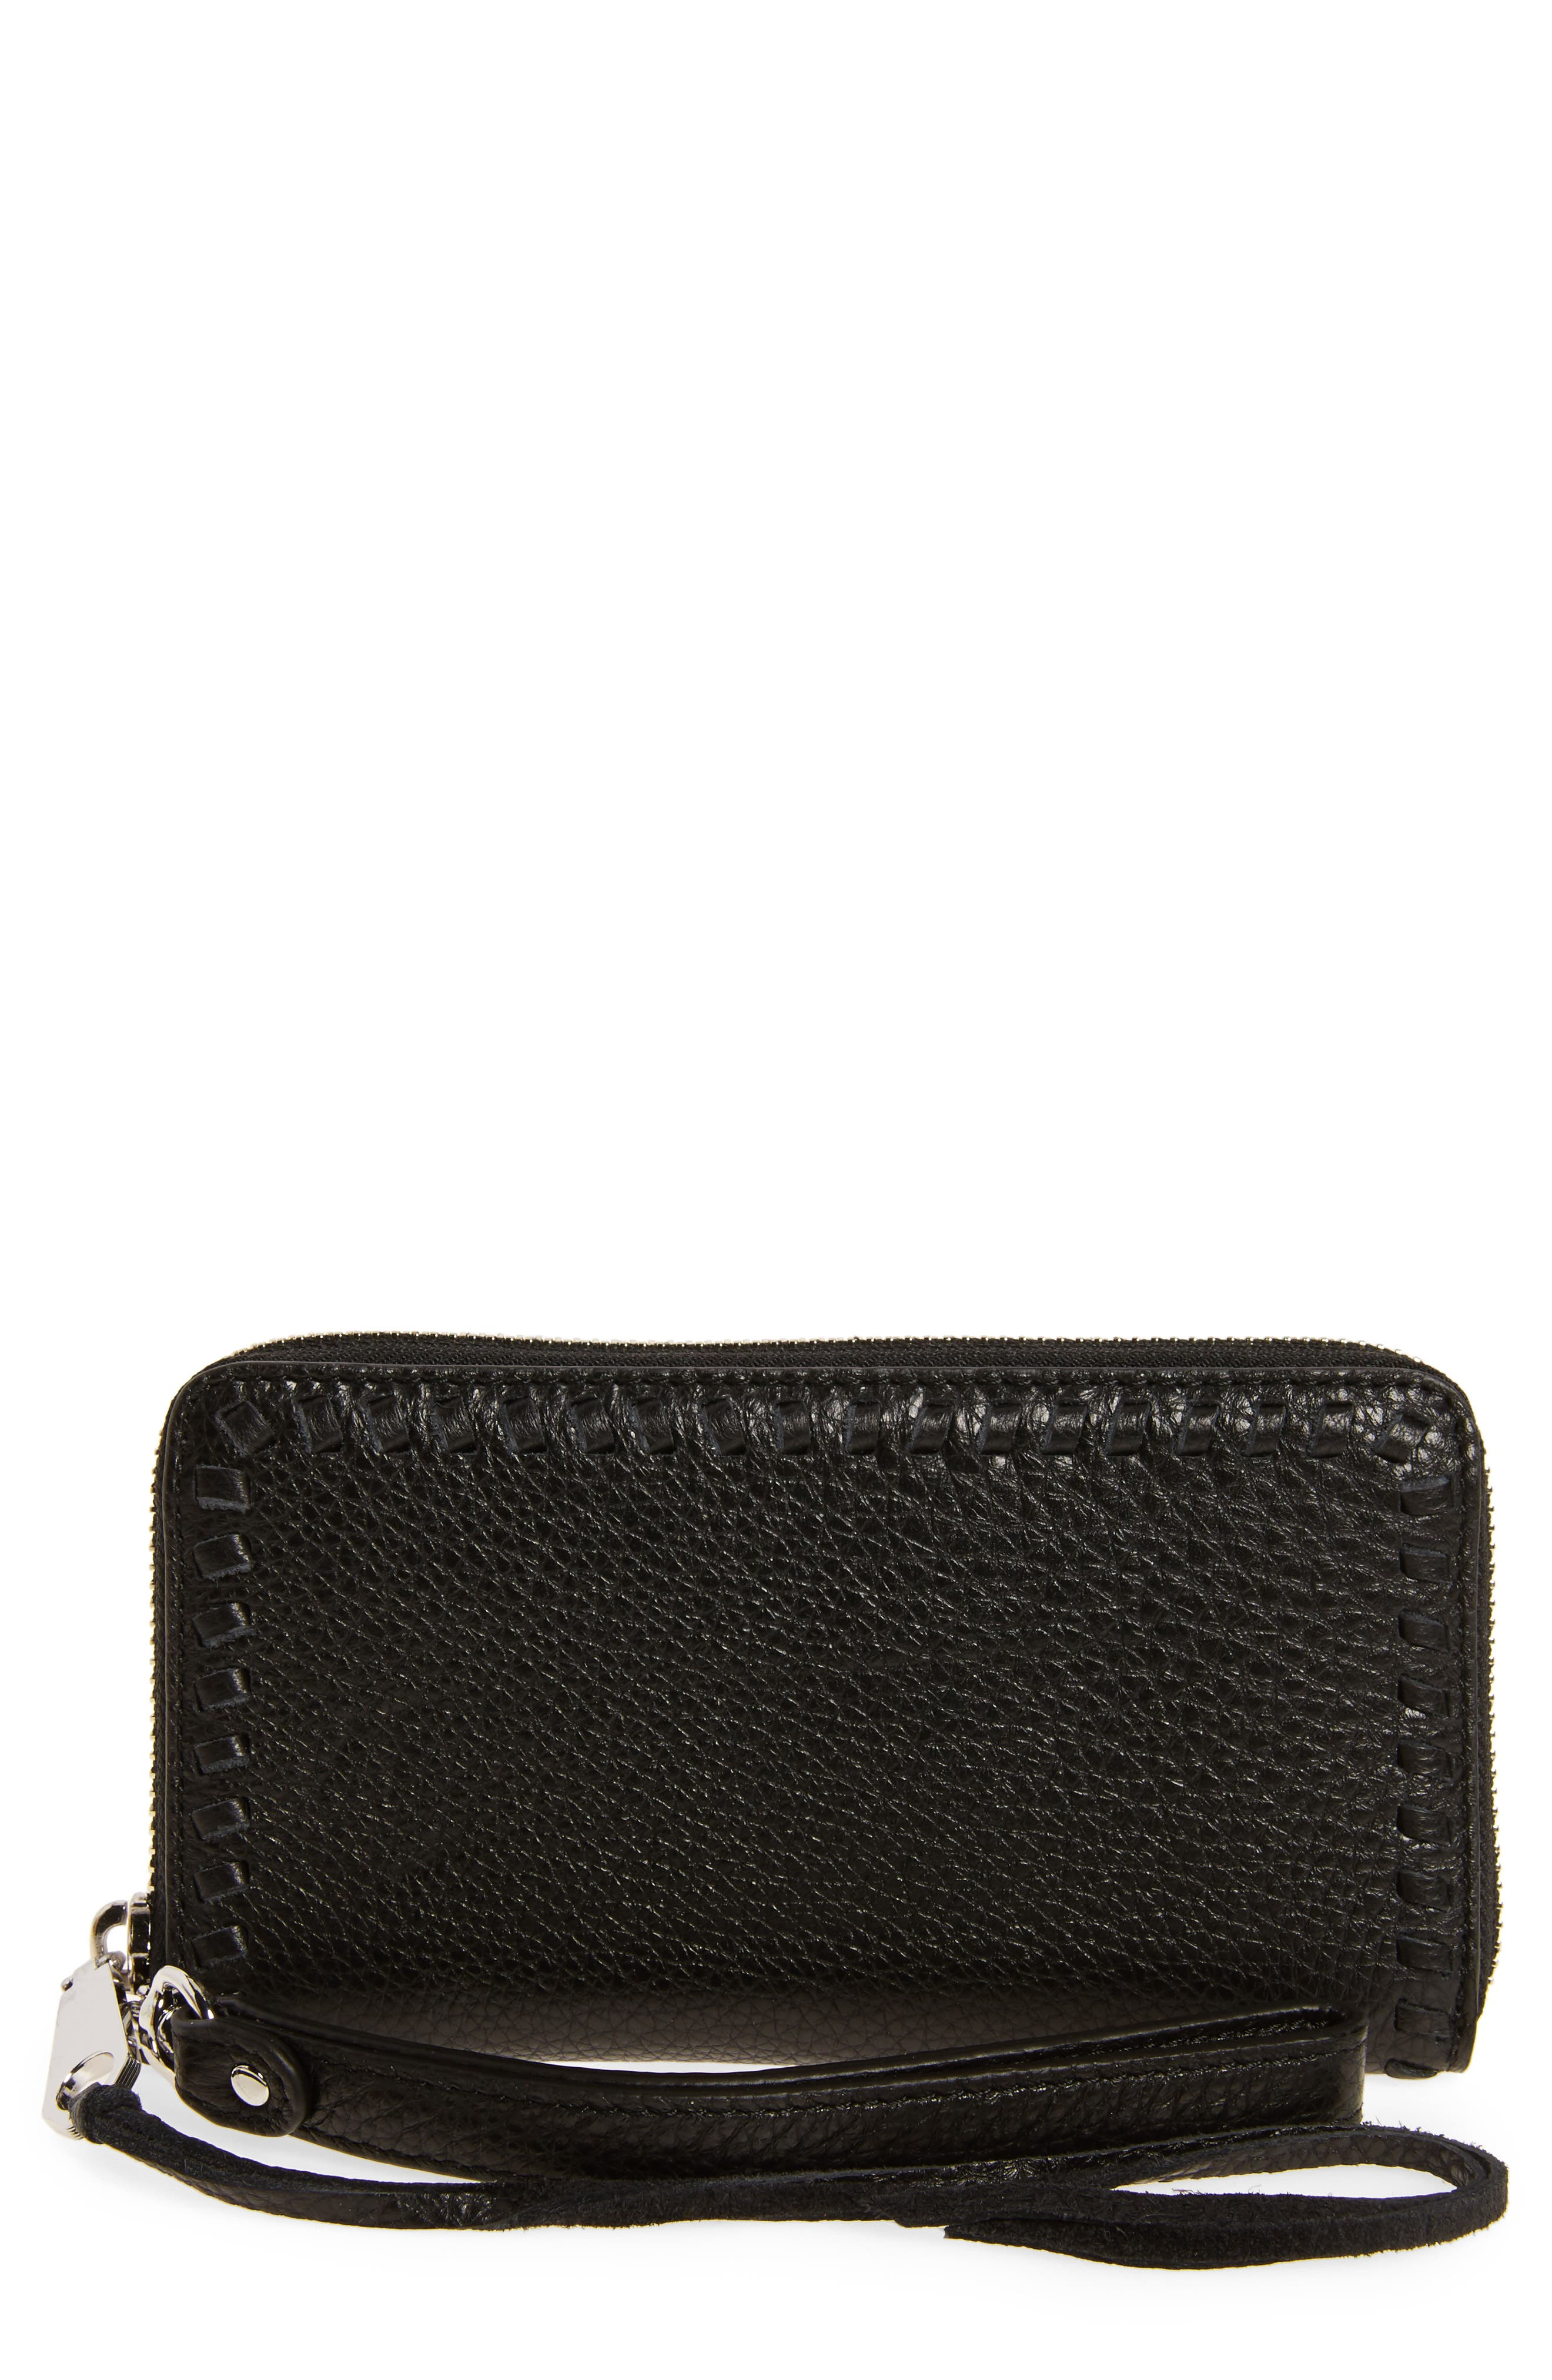 Rebecca Minkoff Vanity Leather Phone Wallet